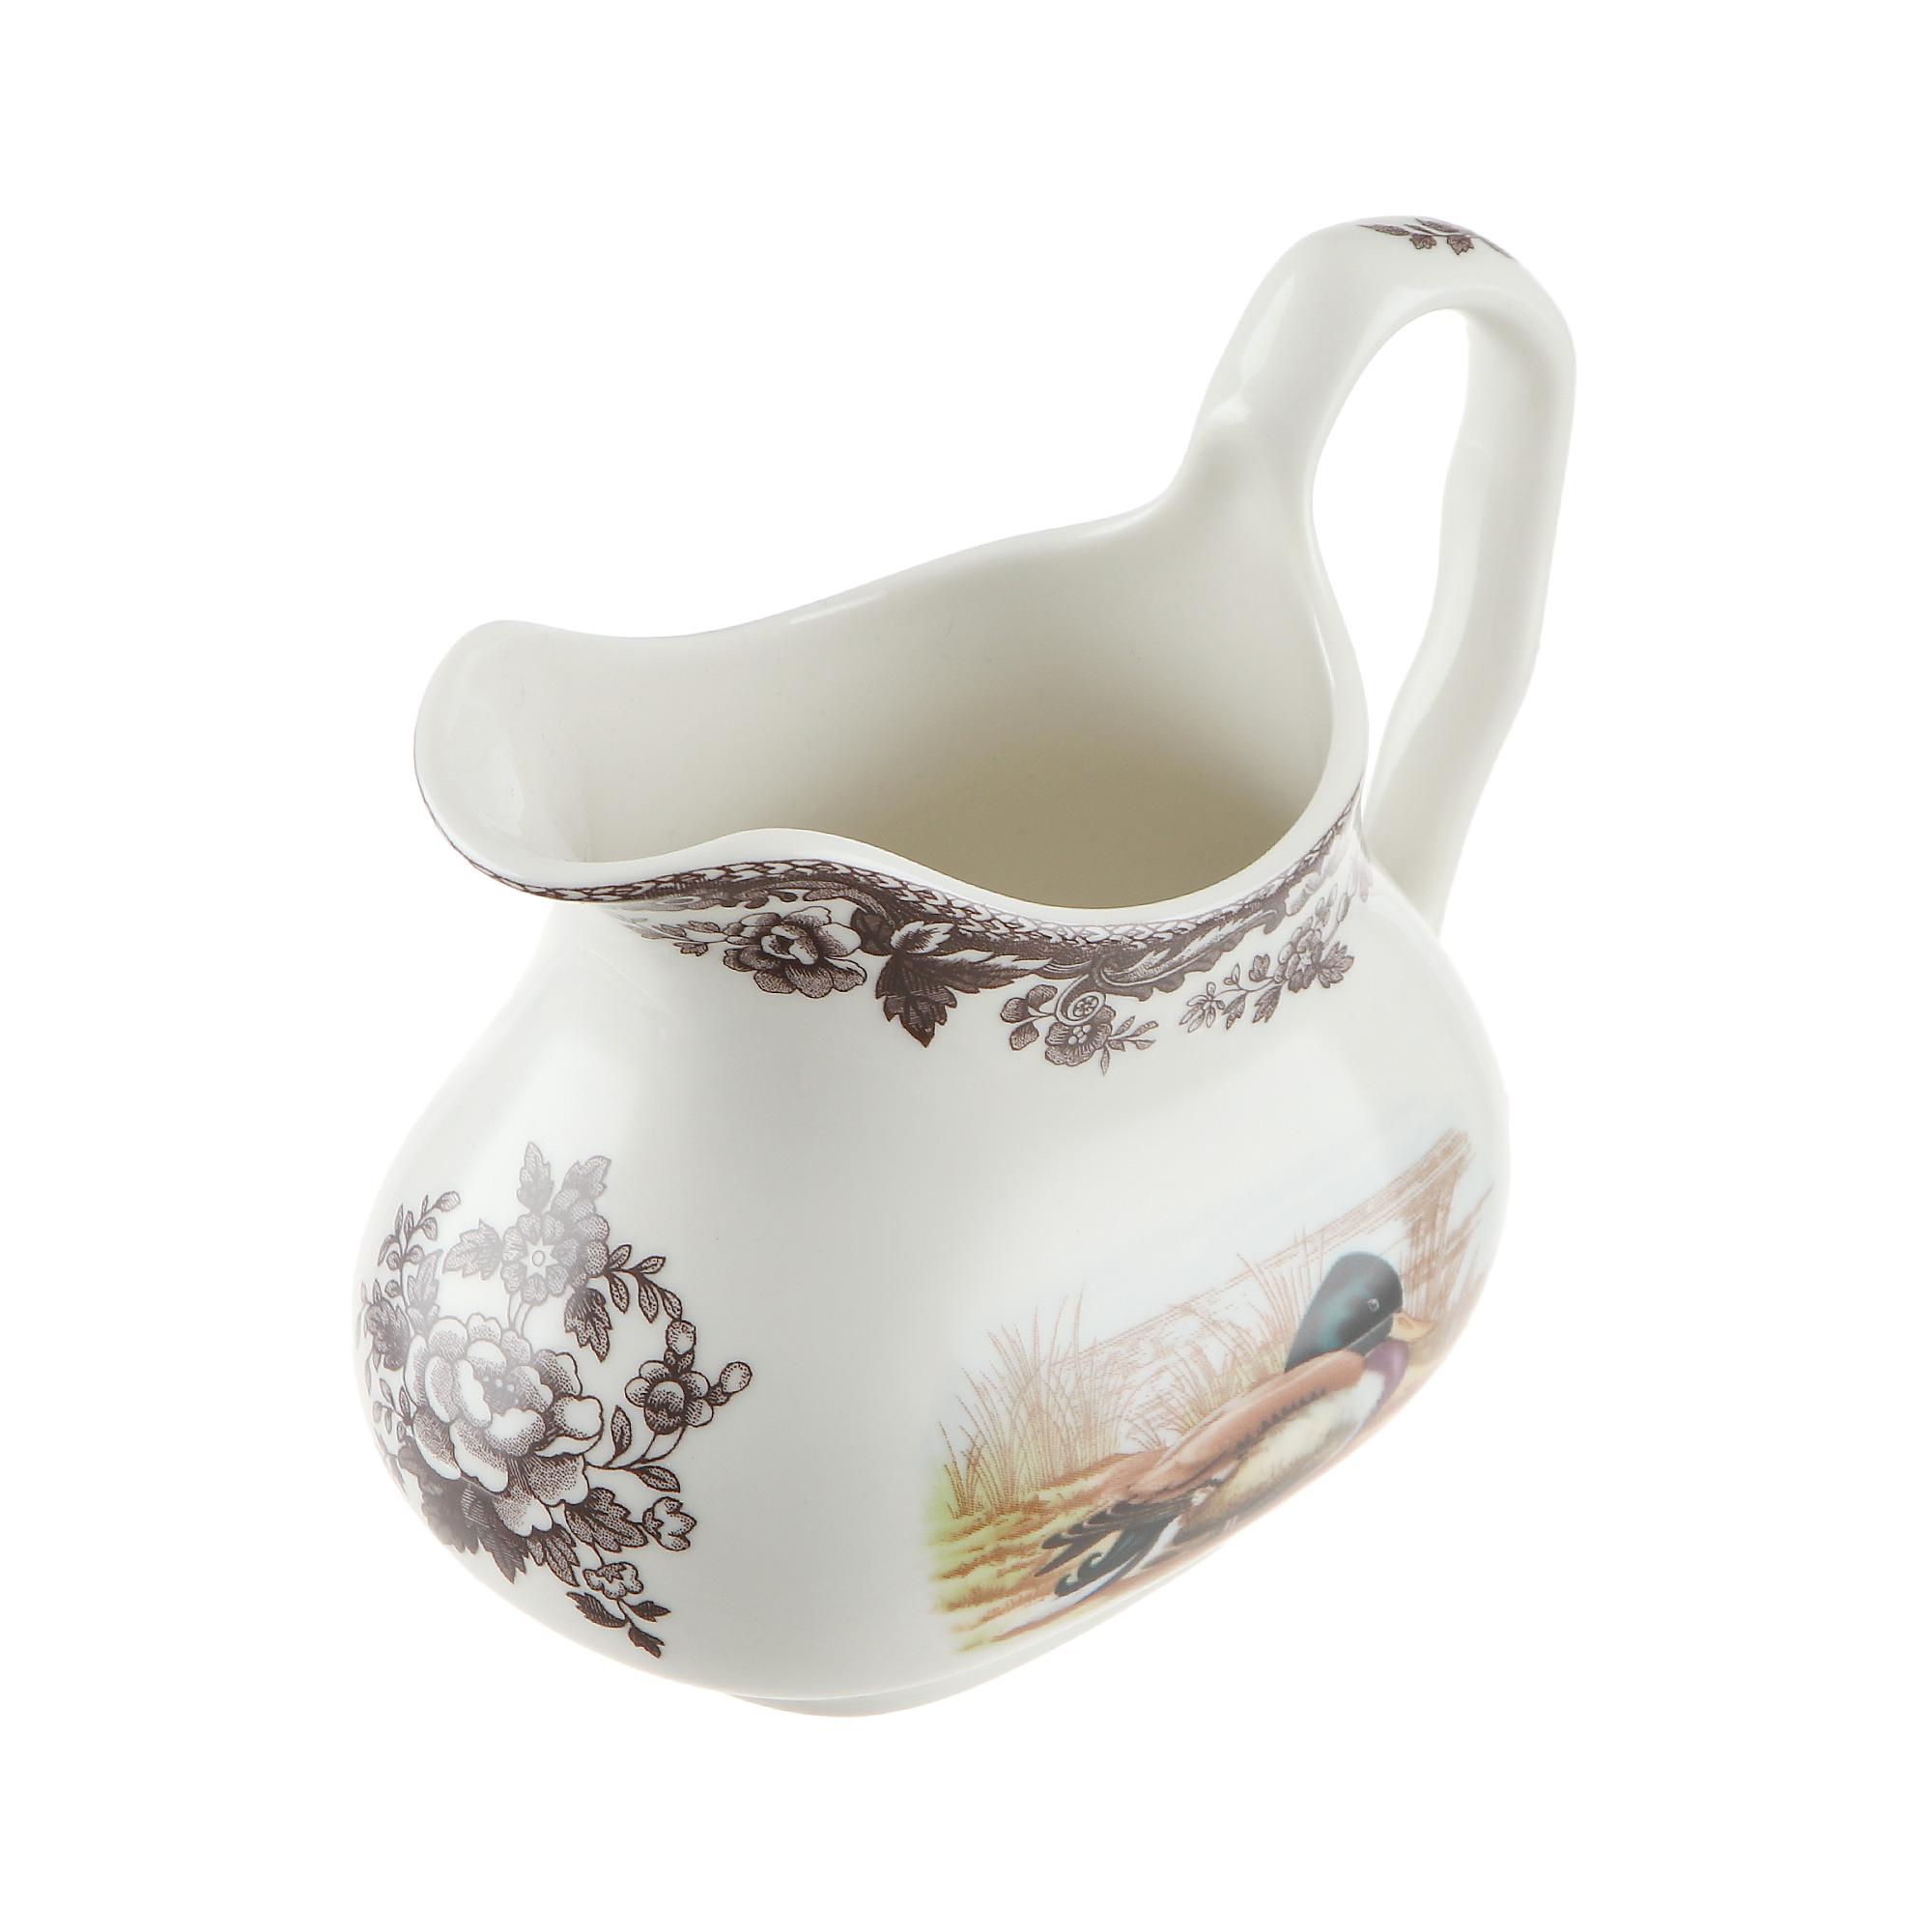 Молочник Spode Английские охотничьи мотивы 220 мл чайник заварочный spode английские охотничьи мотивы 1 3 л